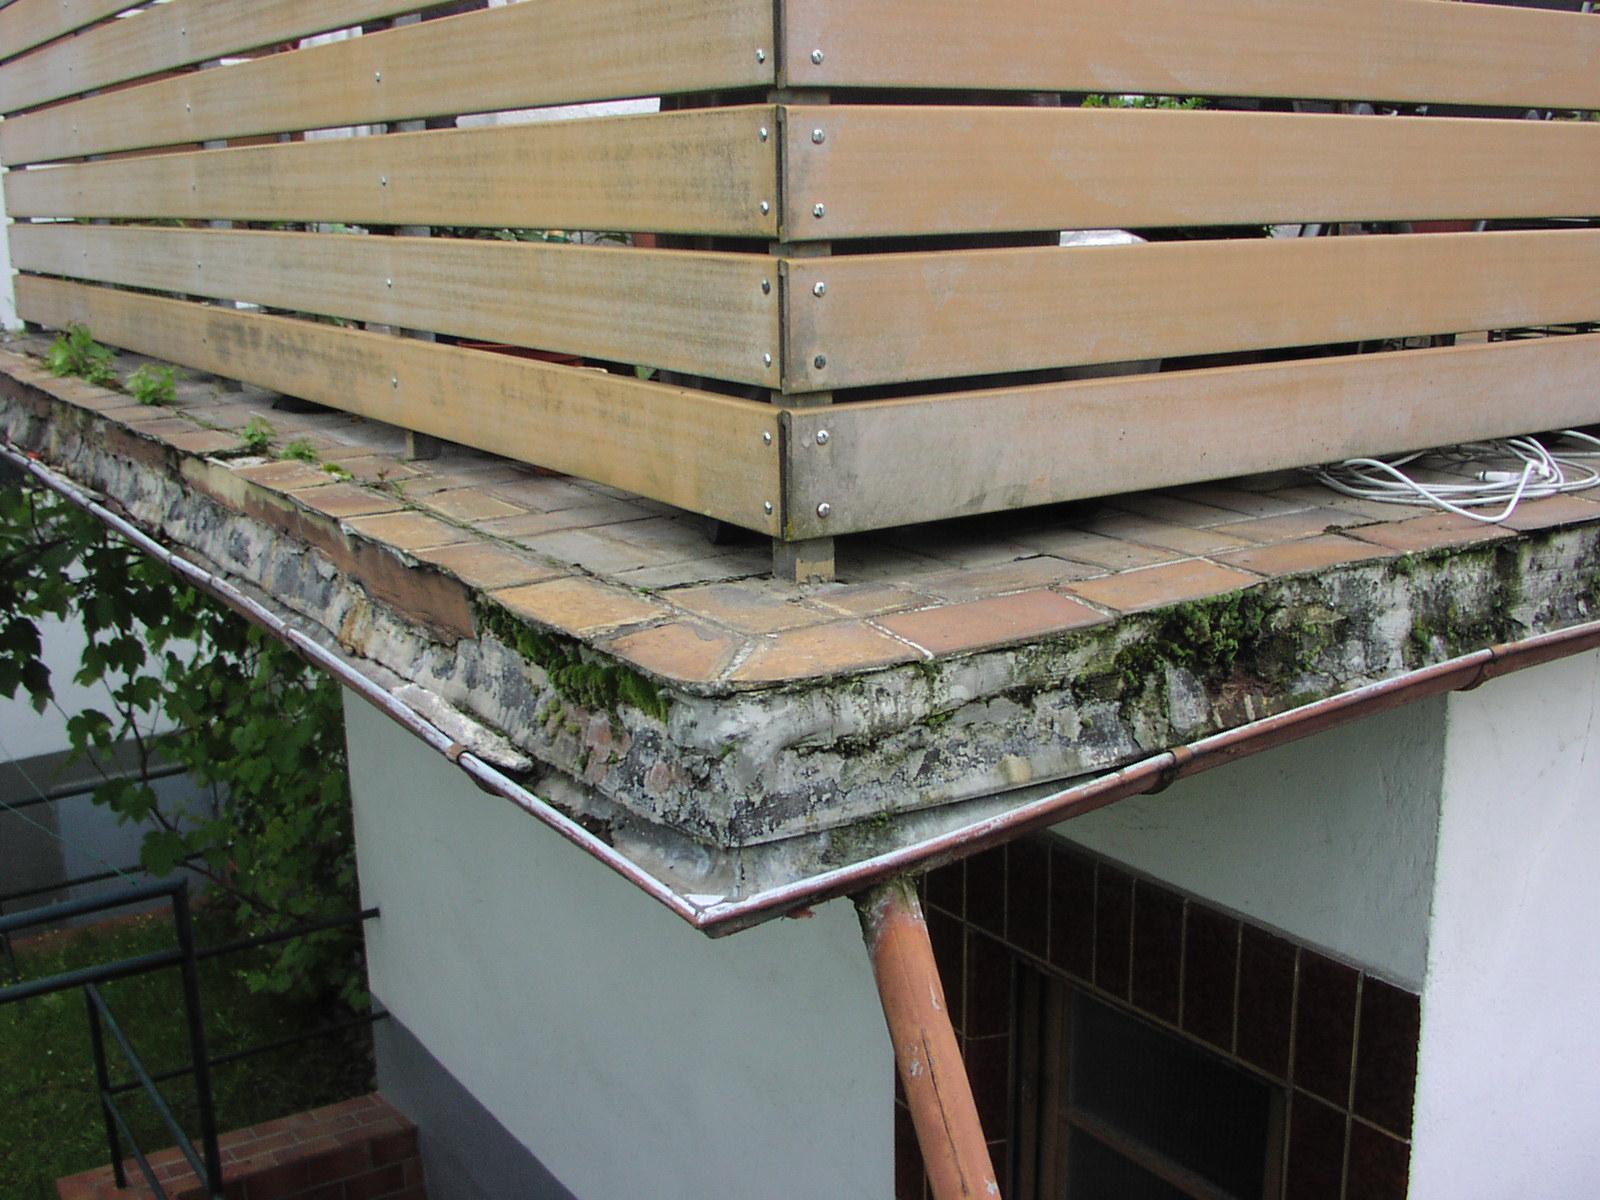 Super Balkonsanierung - Balkonsanierung mit System Frankfurt u. Umgebung QT95